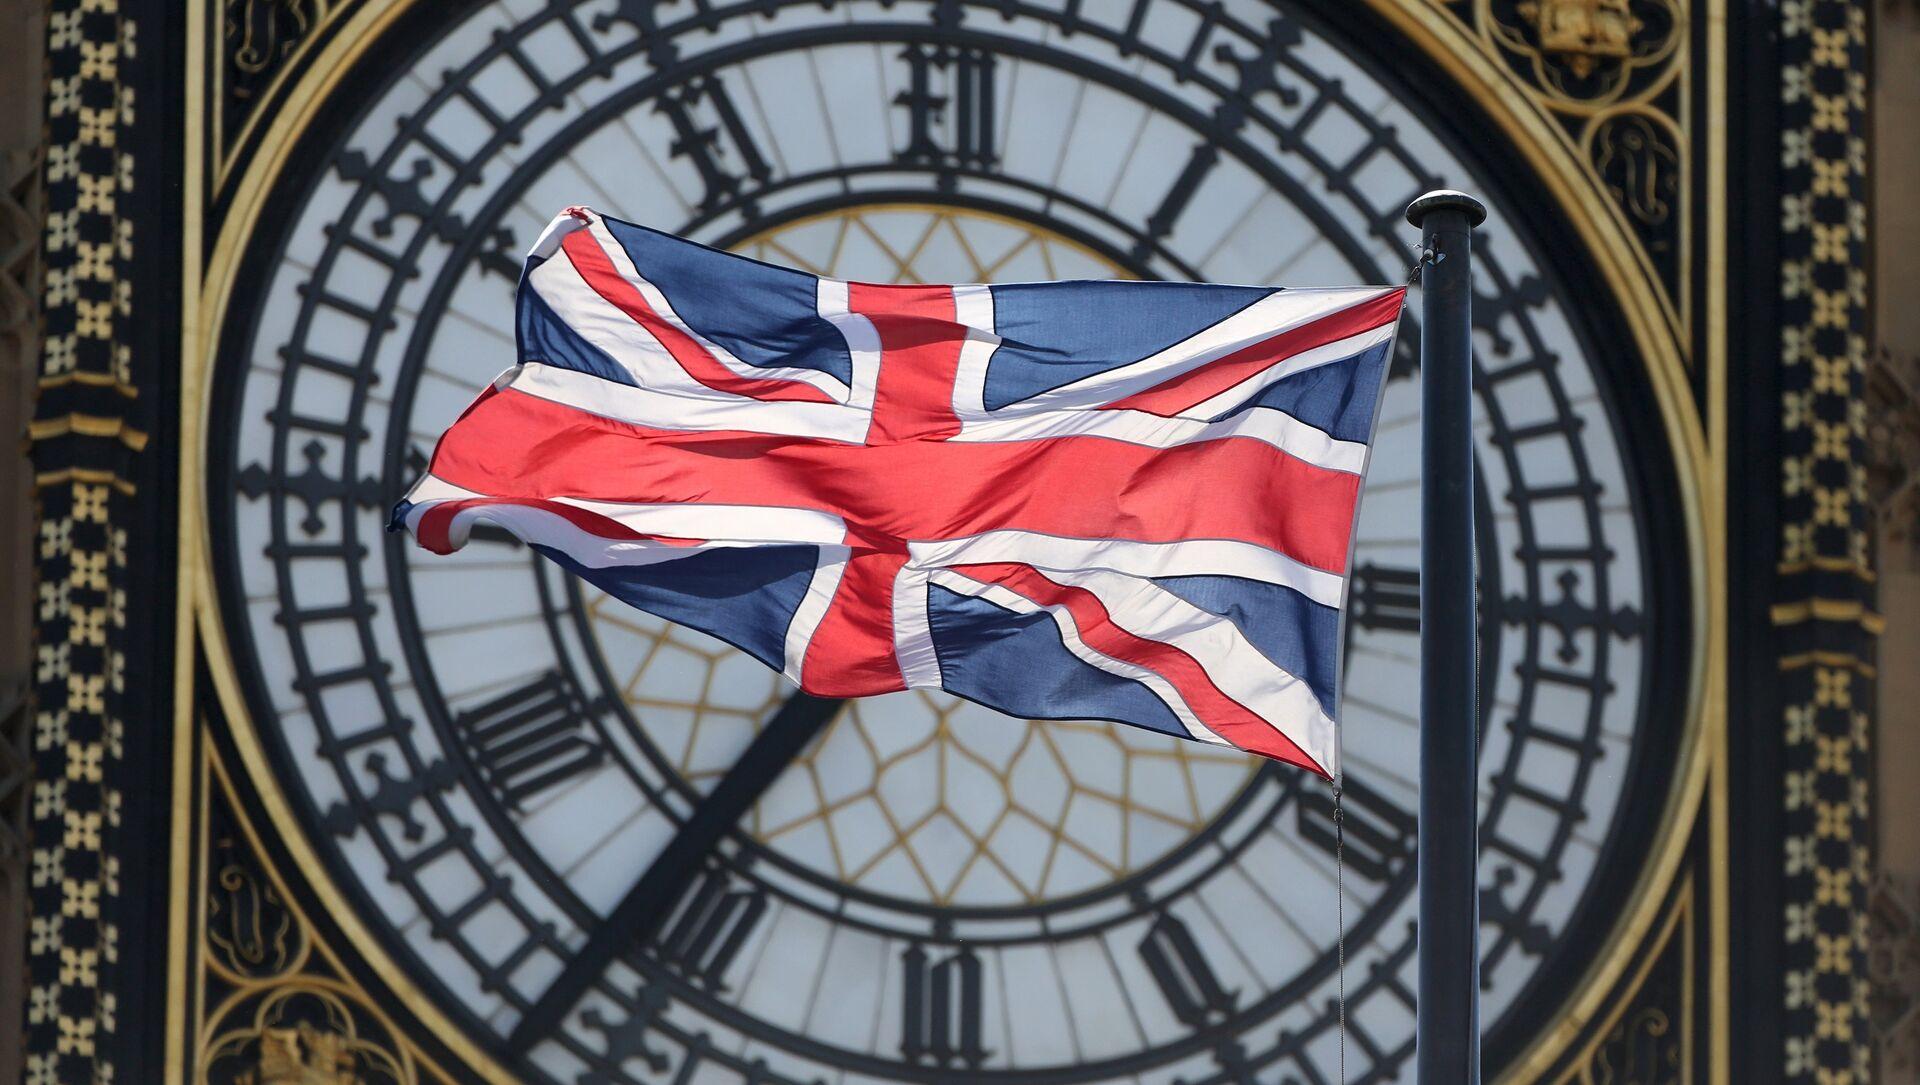 Vlajka Velké Británie - Sputnik France, 1920, 12.02.2021